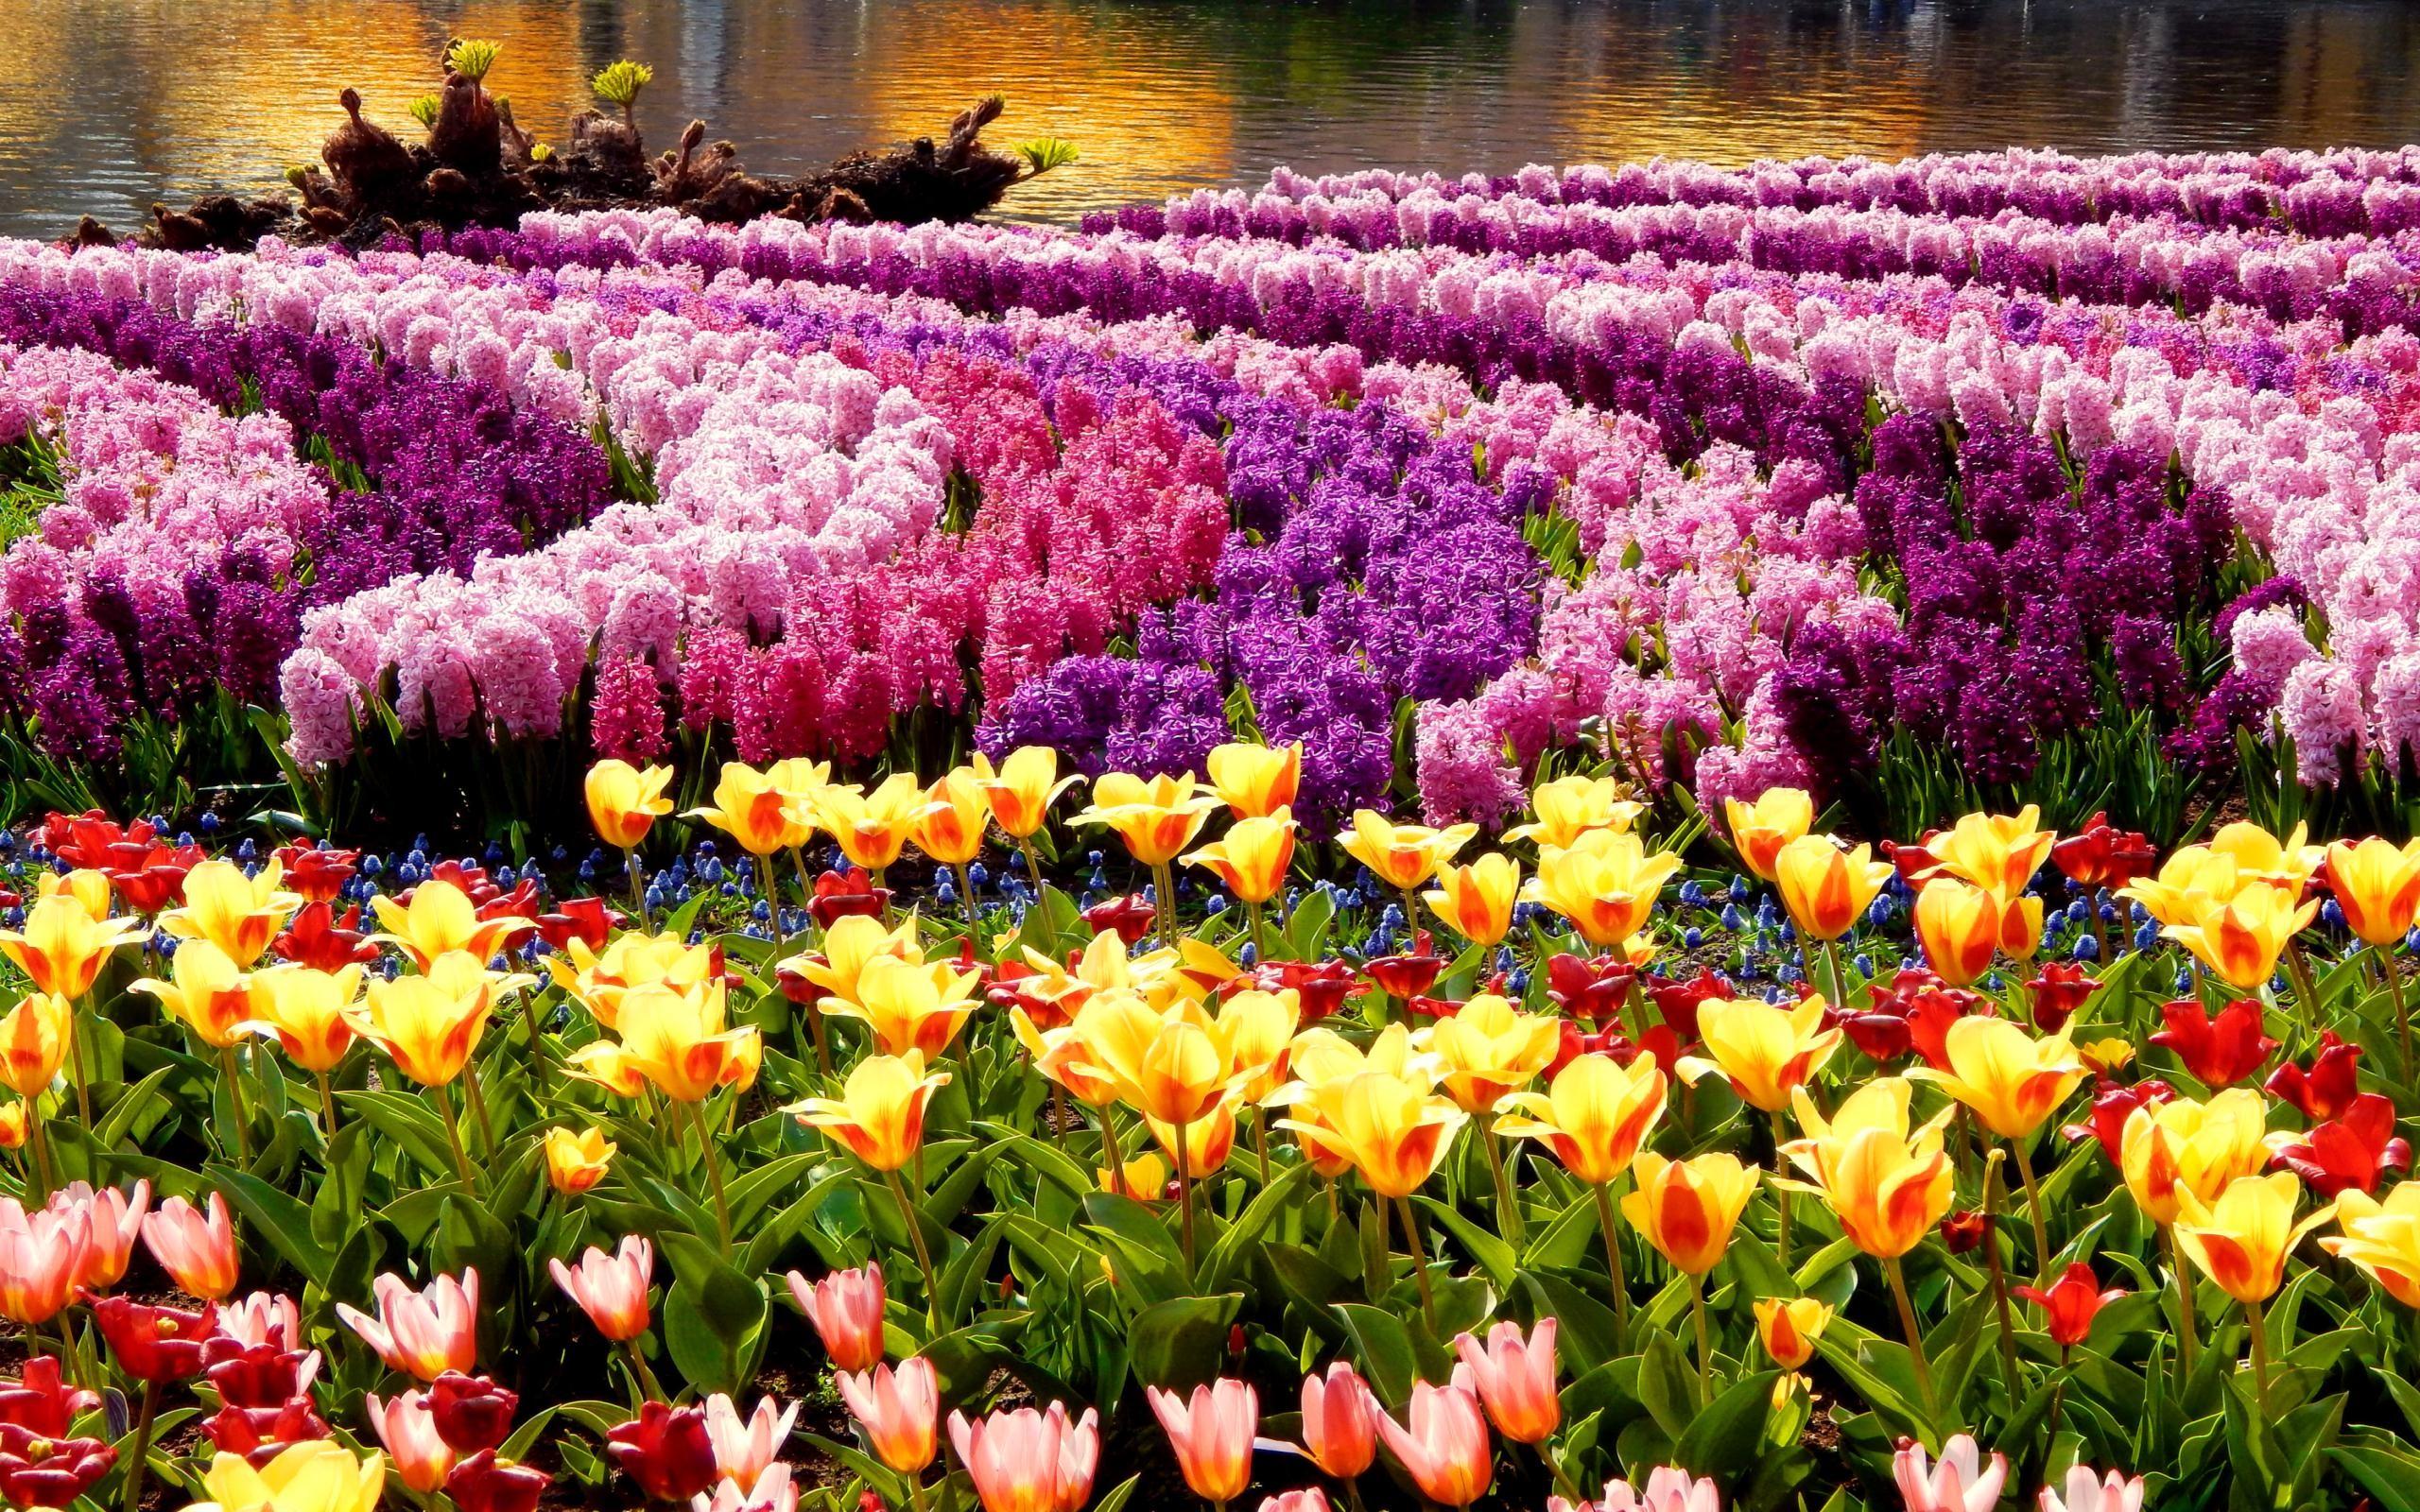 32 Field Of Spring Flowers Wallpaper On Wallpapersafari